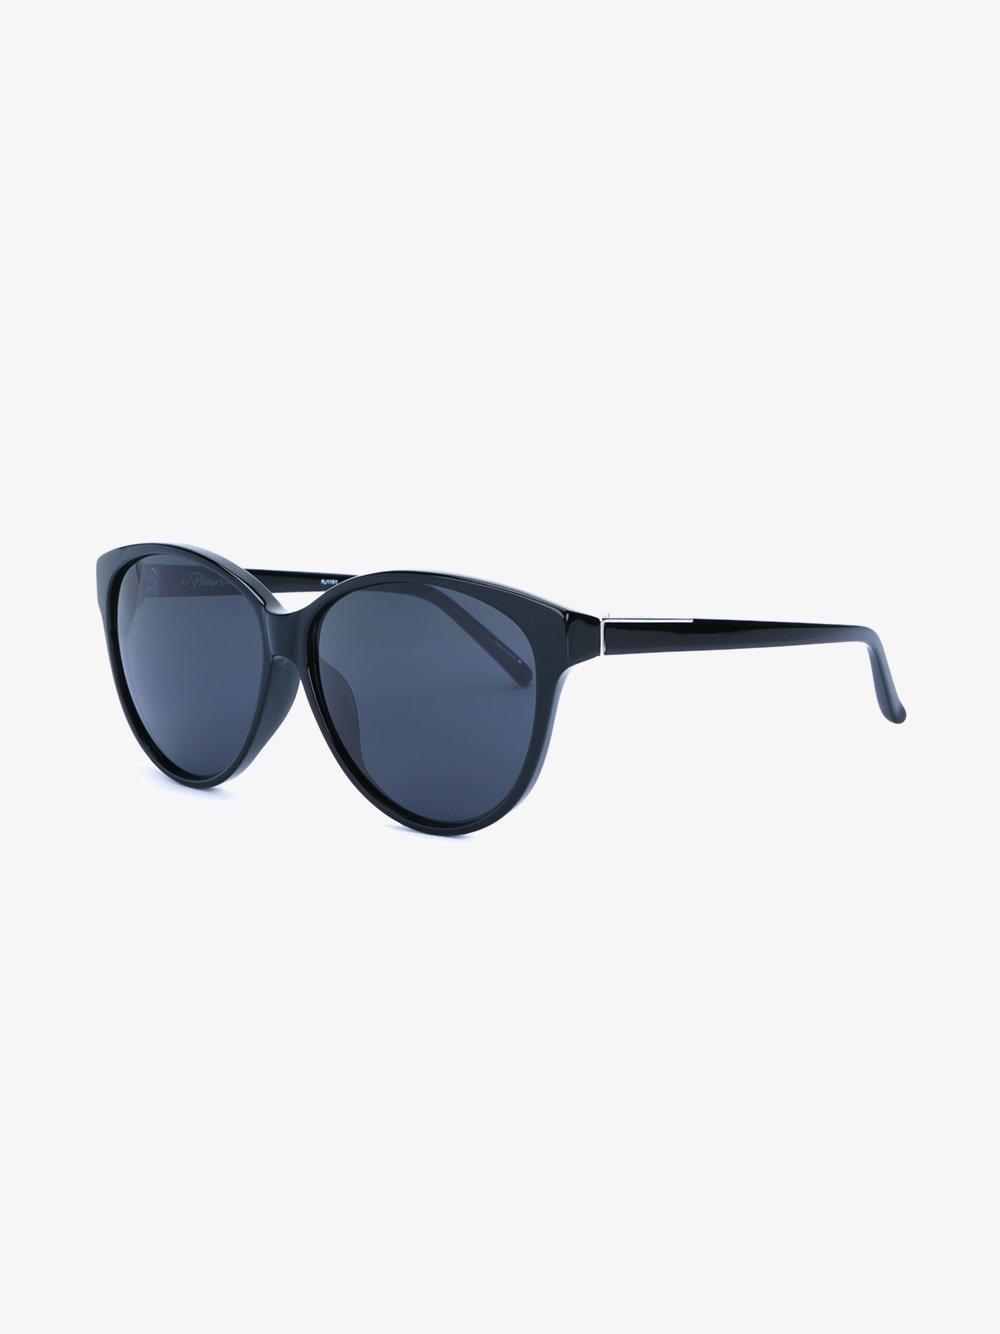 Linda Farrow Cat Eye Frame Sunglasses in Black